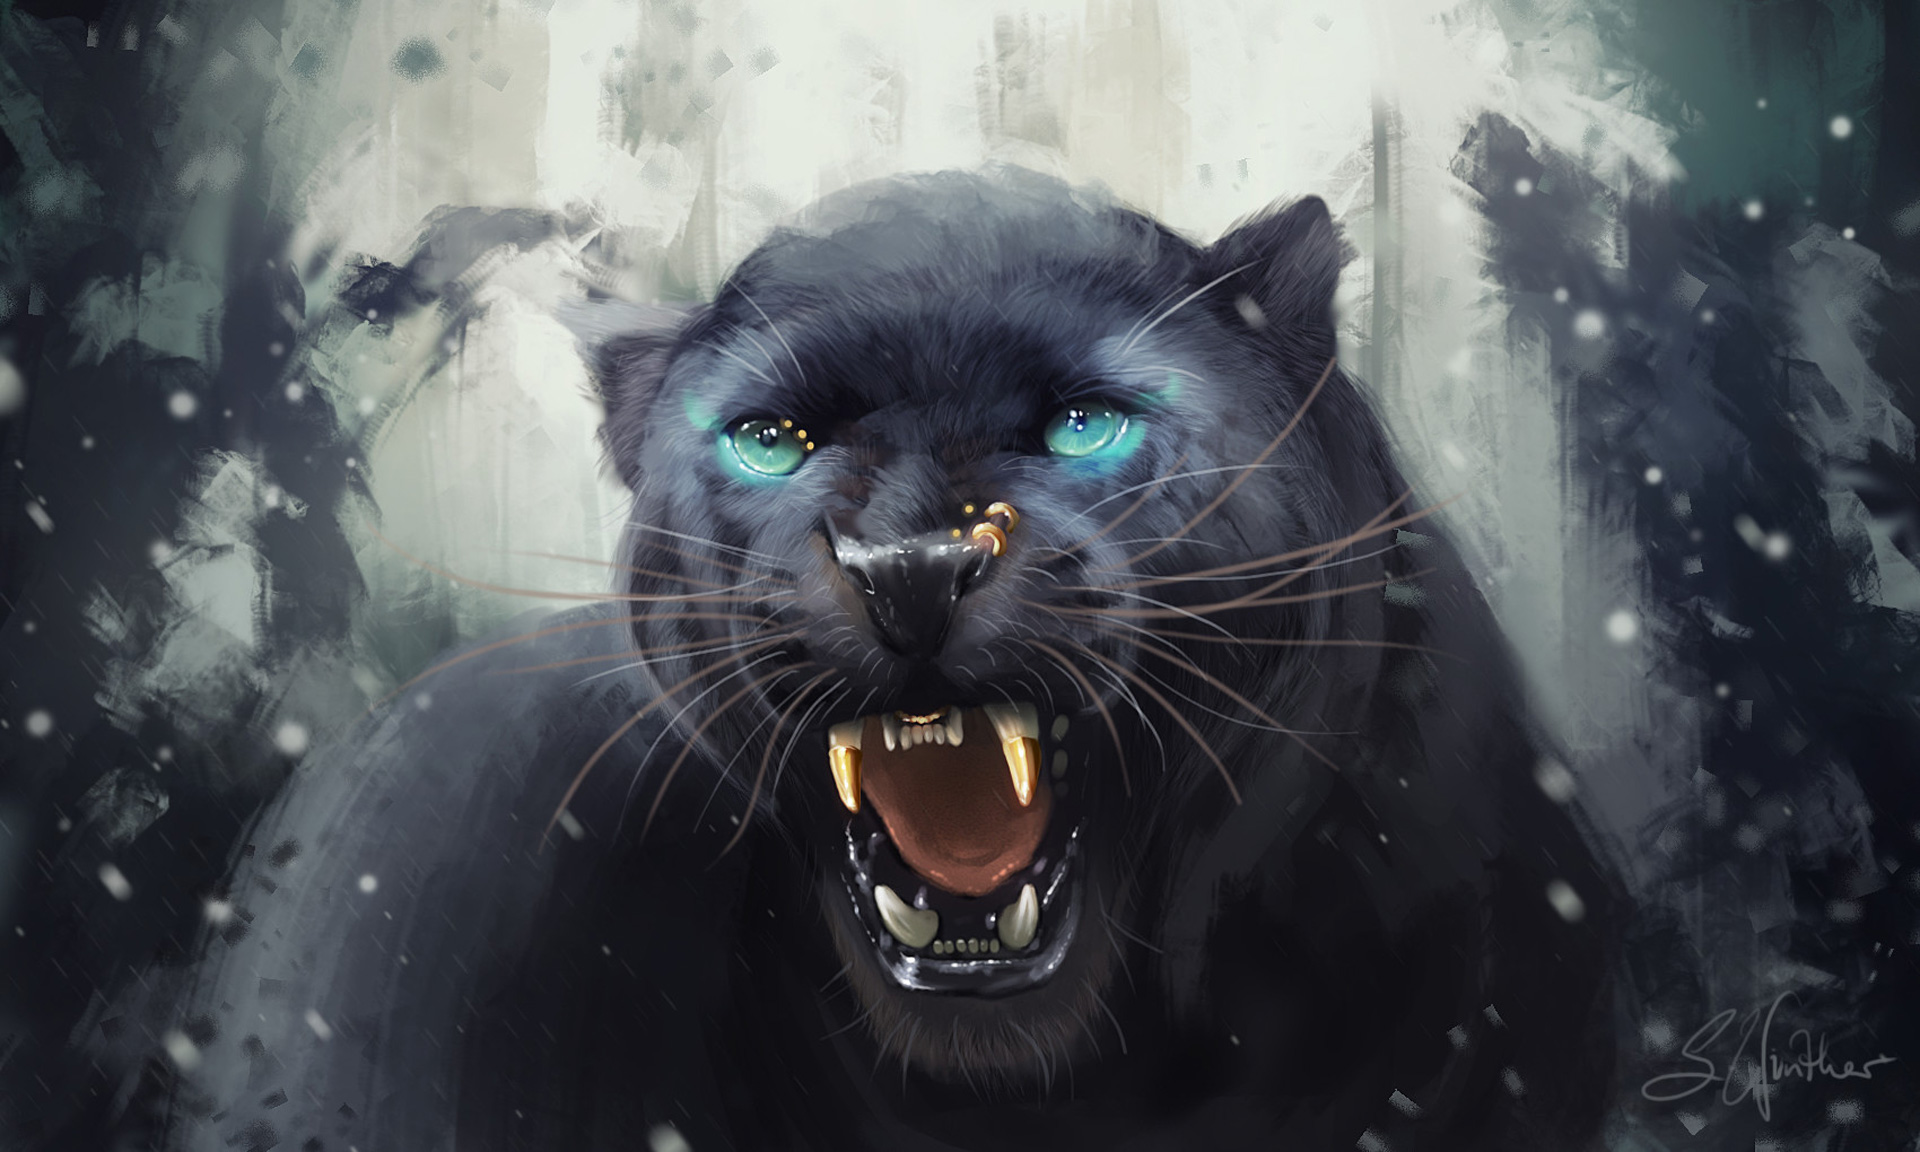 Black Panther Girls Wallpaper Hd Black Panther Roar Artwork Hd Artist 4k Wallpapers